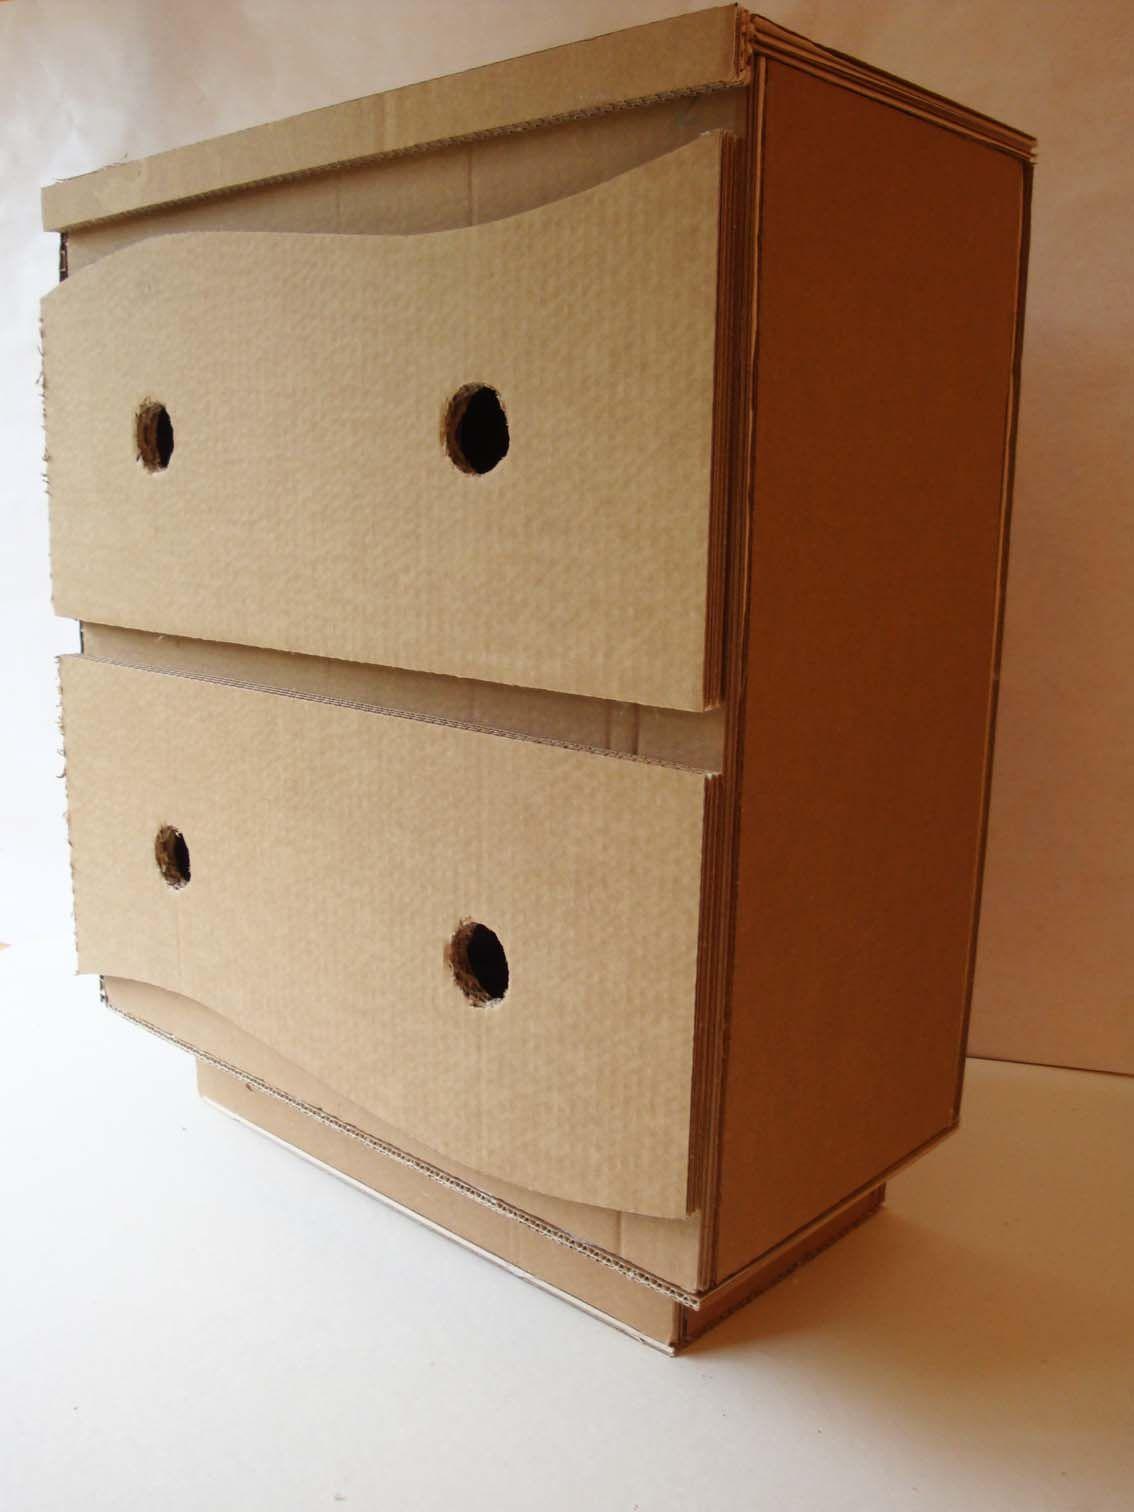 La Coccinelle Ecolo Etagere En Carton Meuble En Carton Meubles En Carton